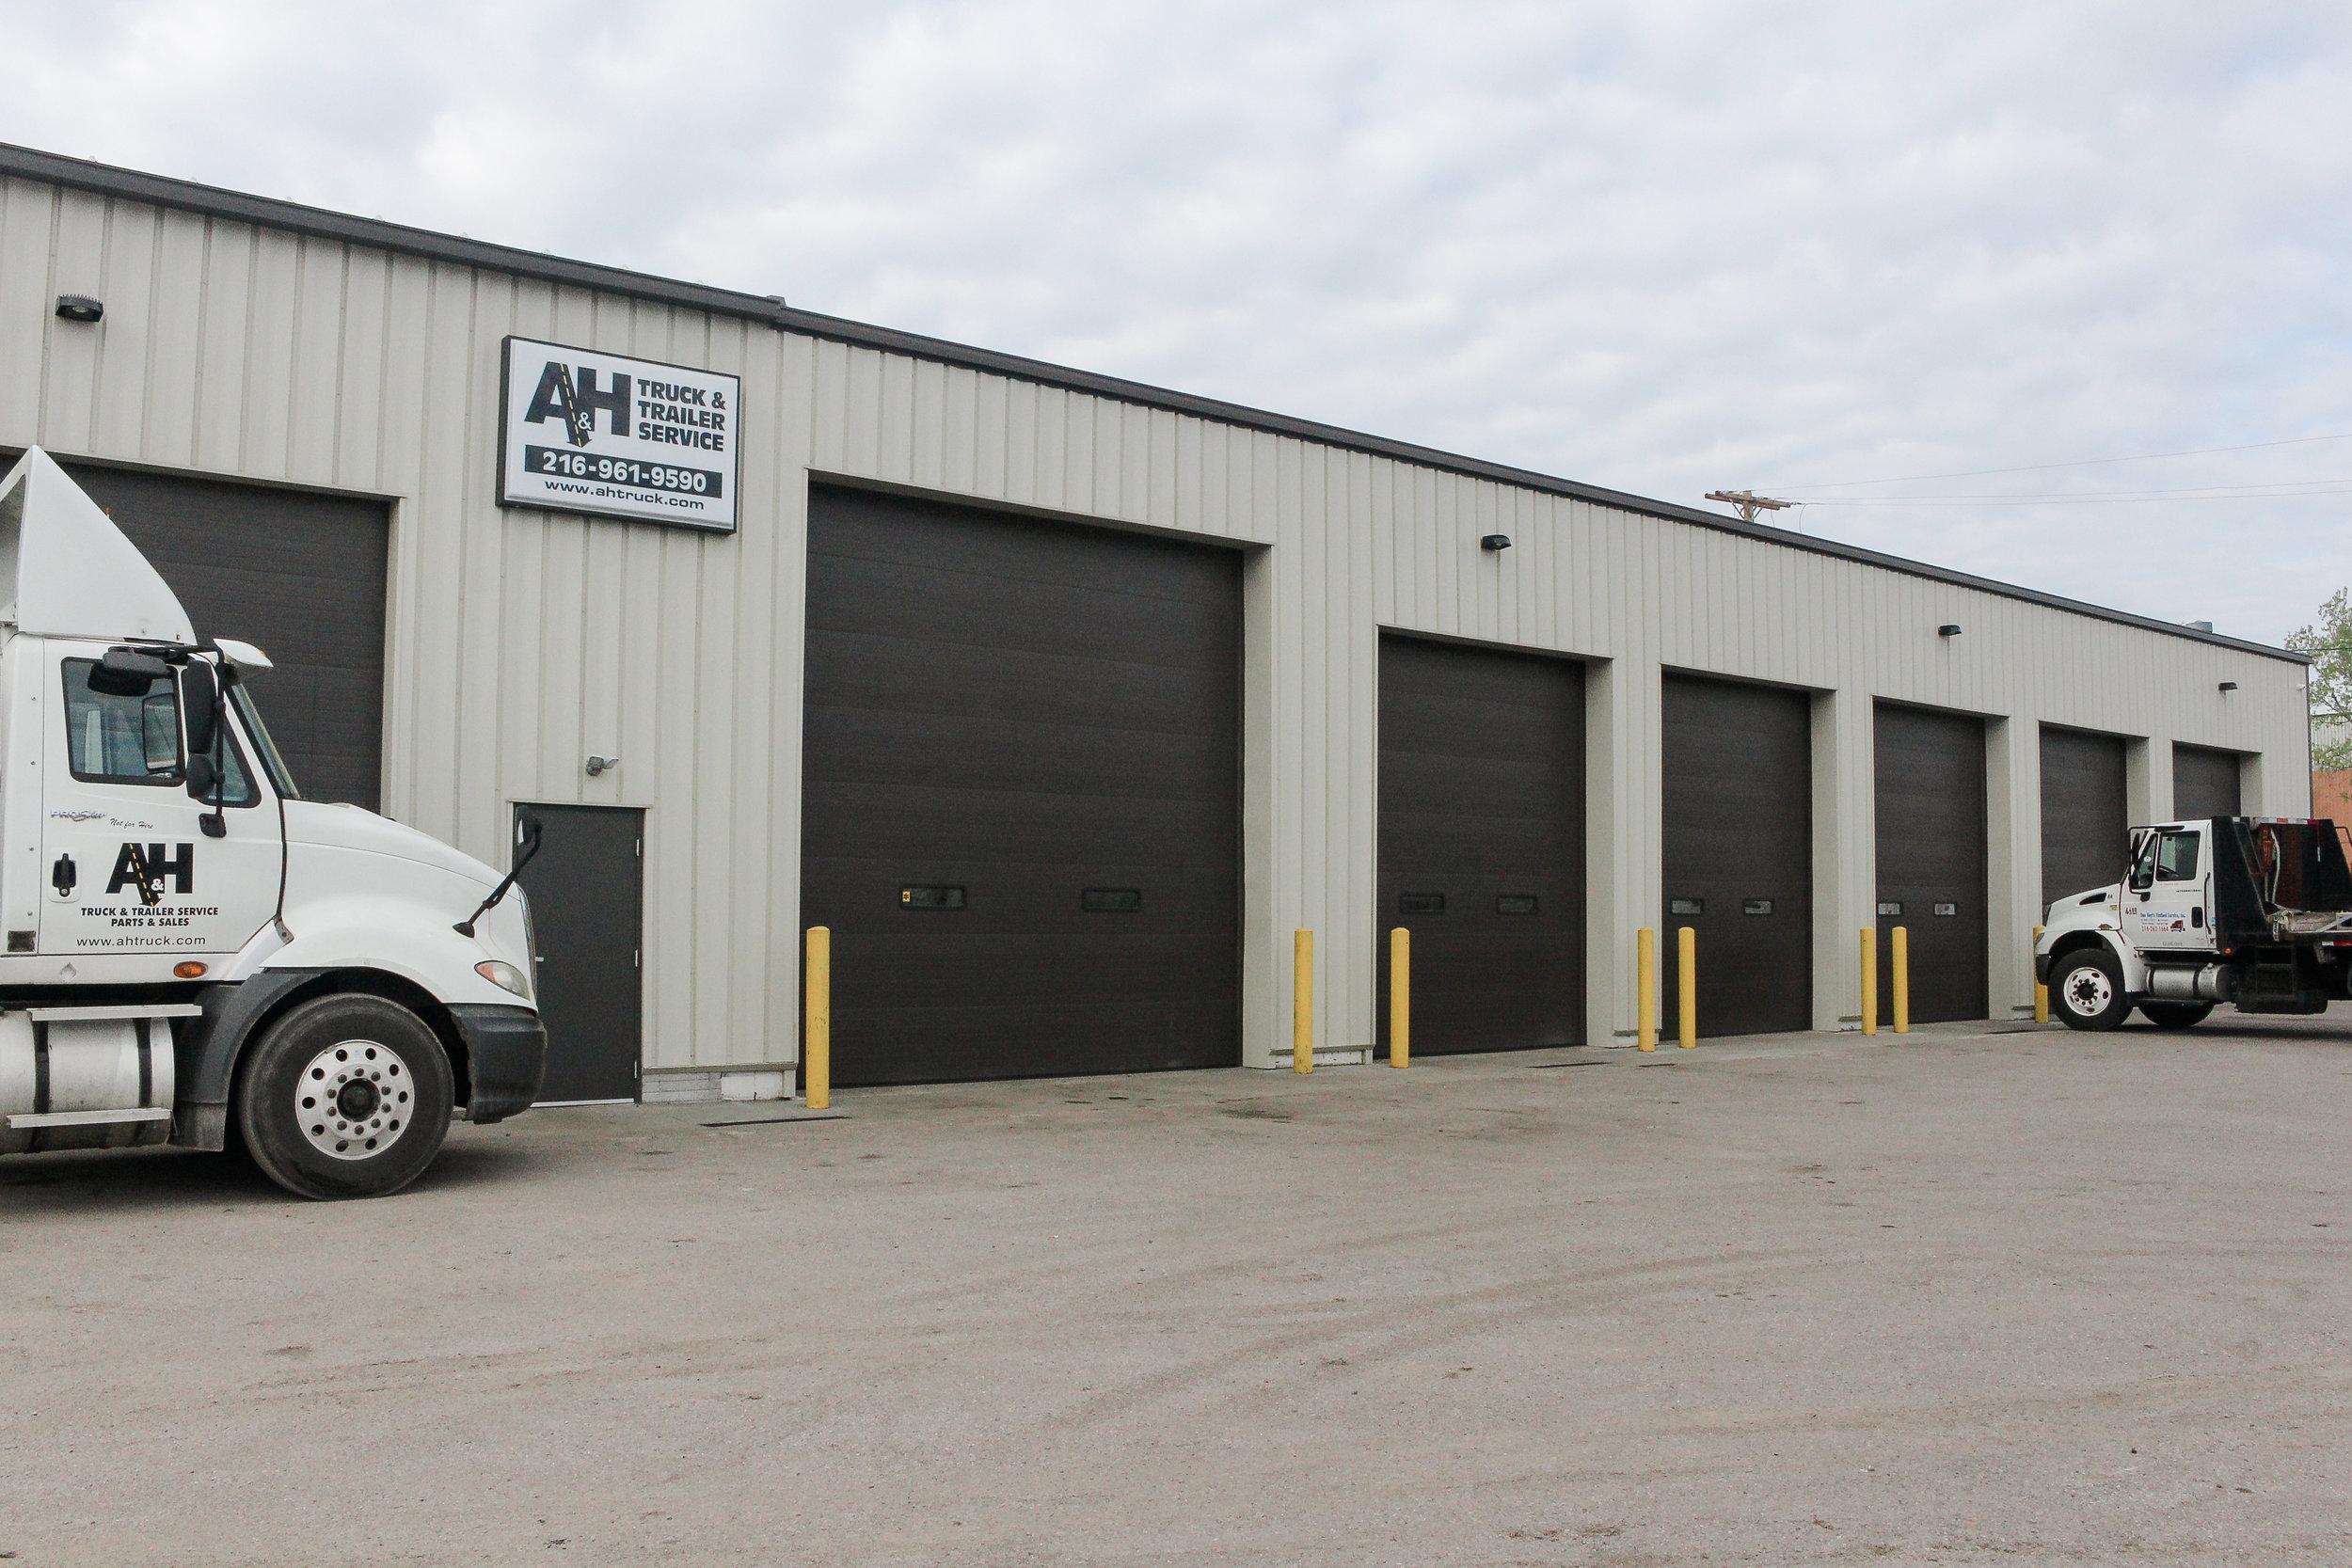 A&H Truck & Repair